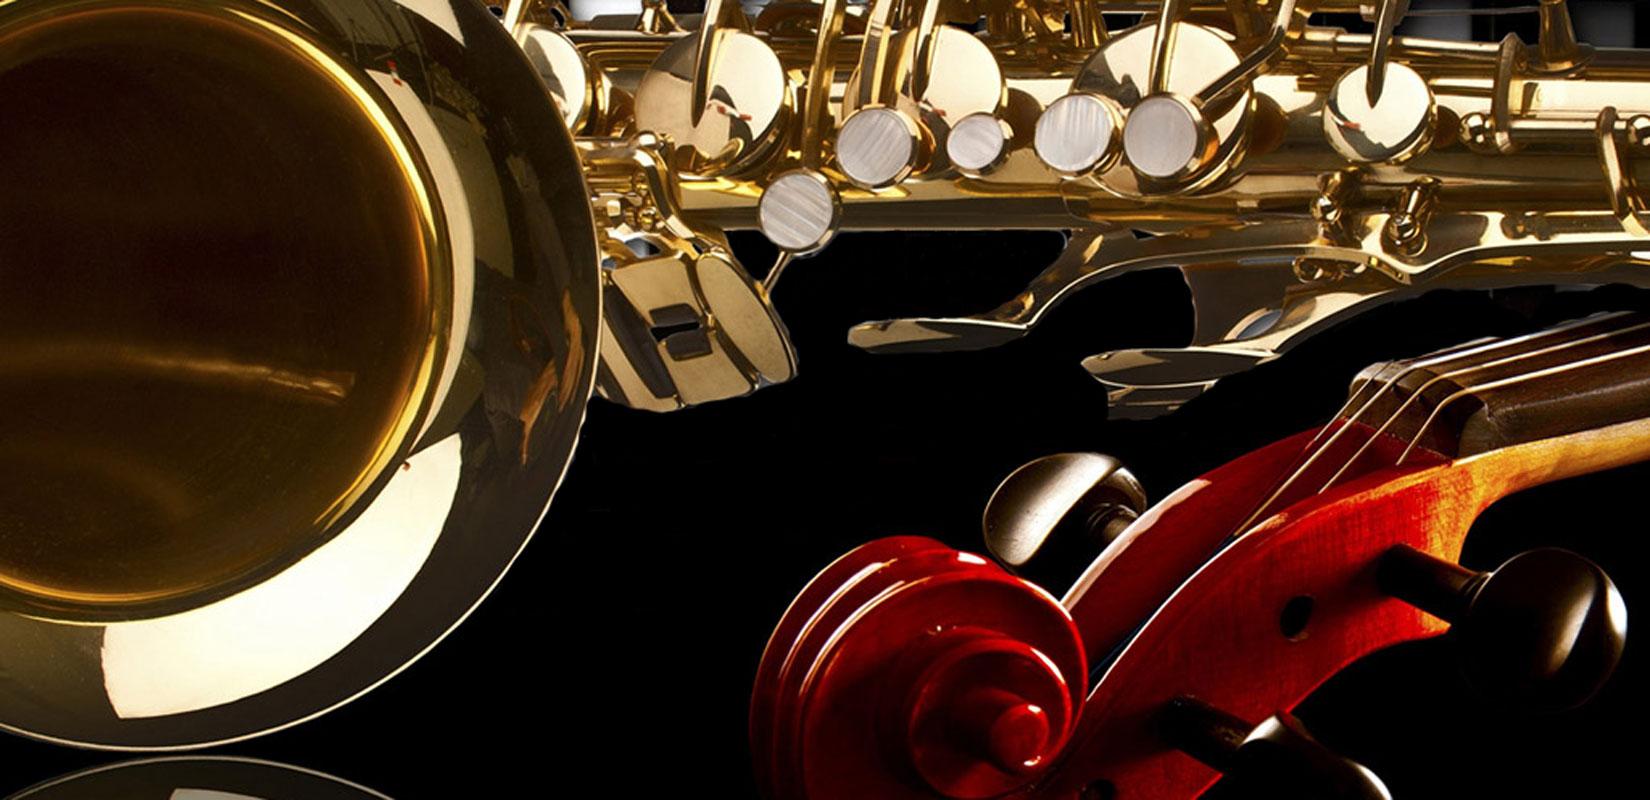 Fall Evening Wallpapers Almyrida Resort Saxophone Meets Violin